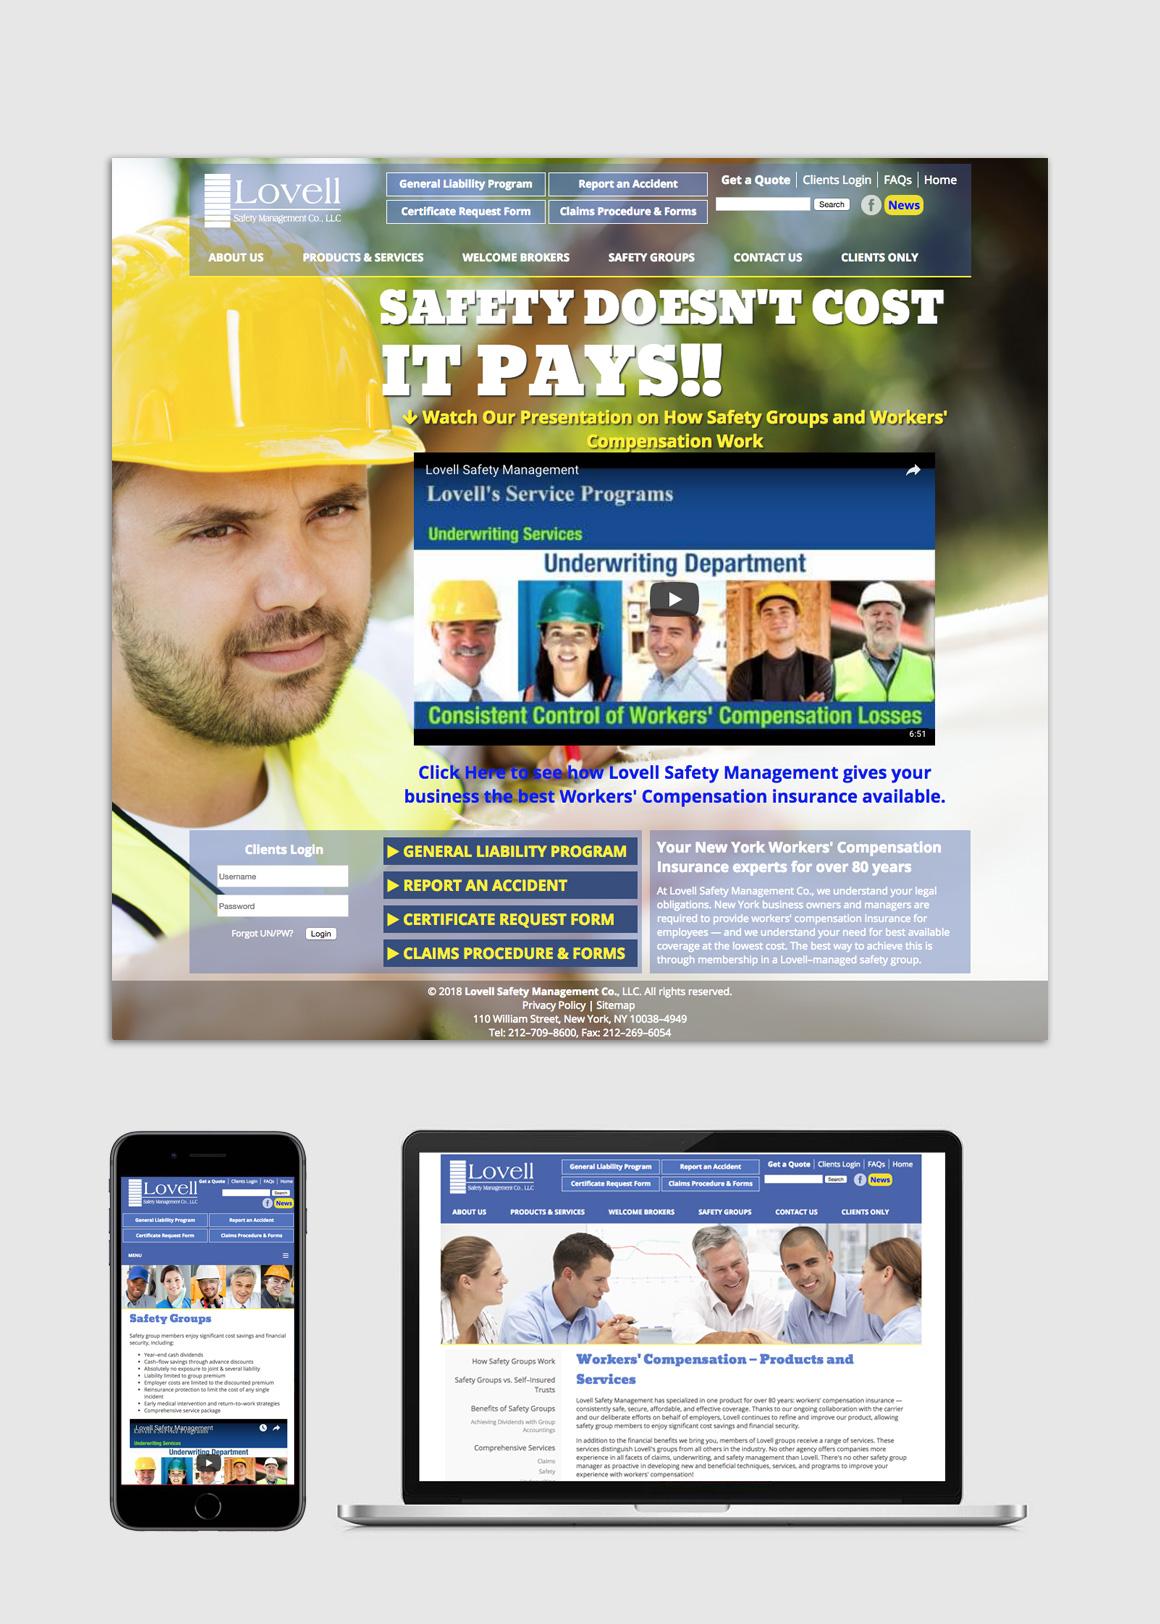 Portfolio: Lovell Safety Management Co. - Web Design and Development